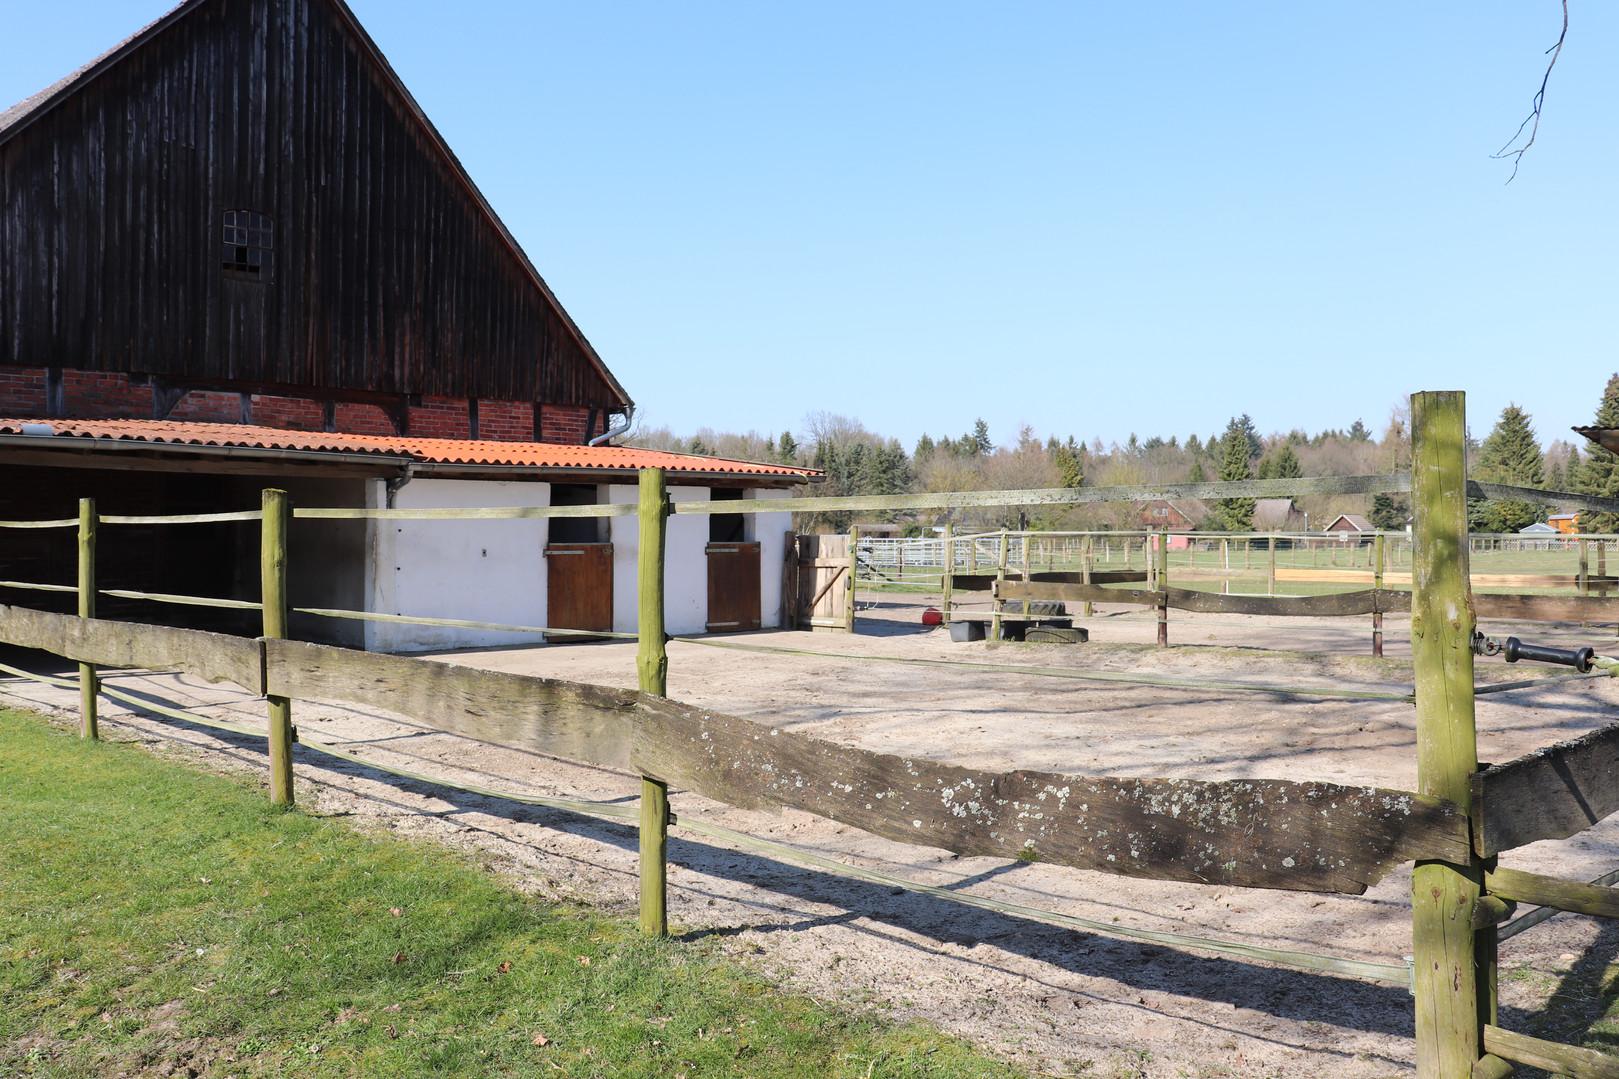 Dennhornshof Gastpferde